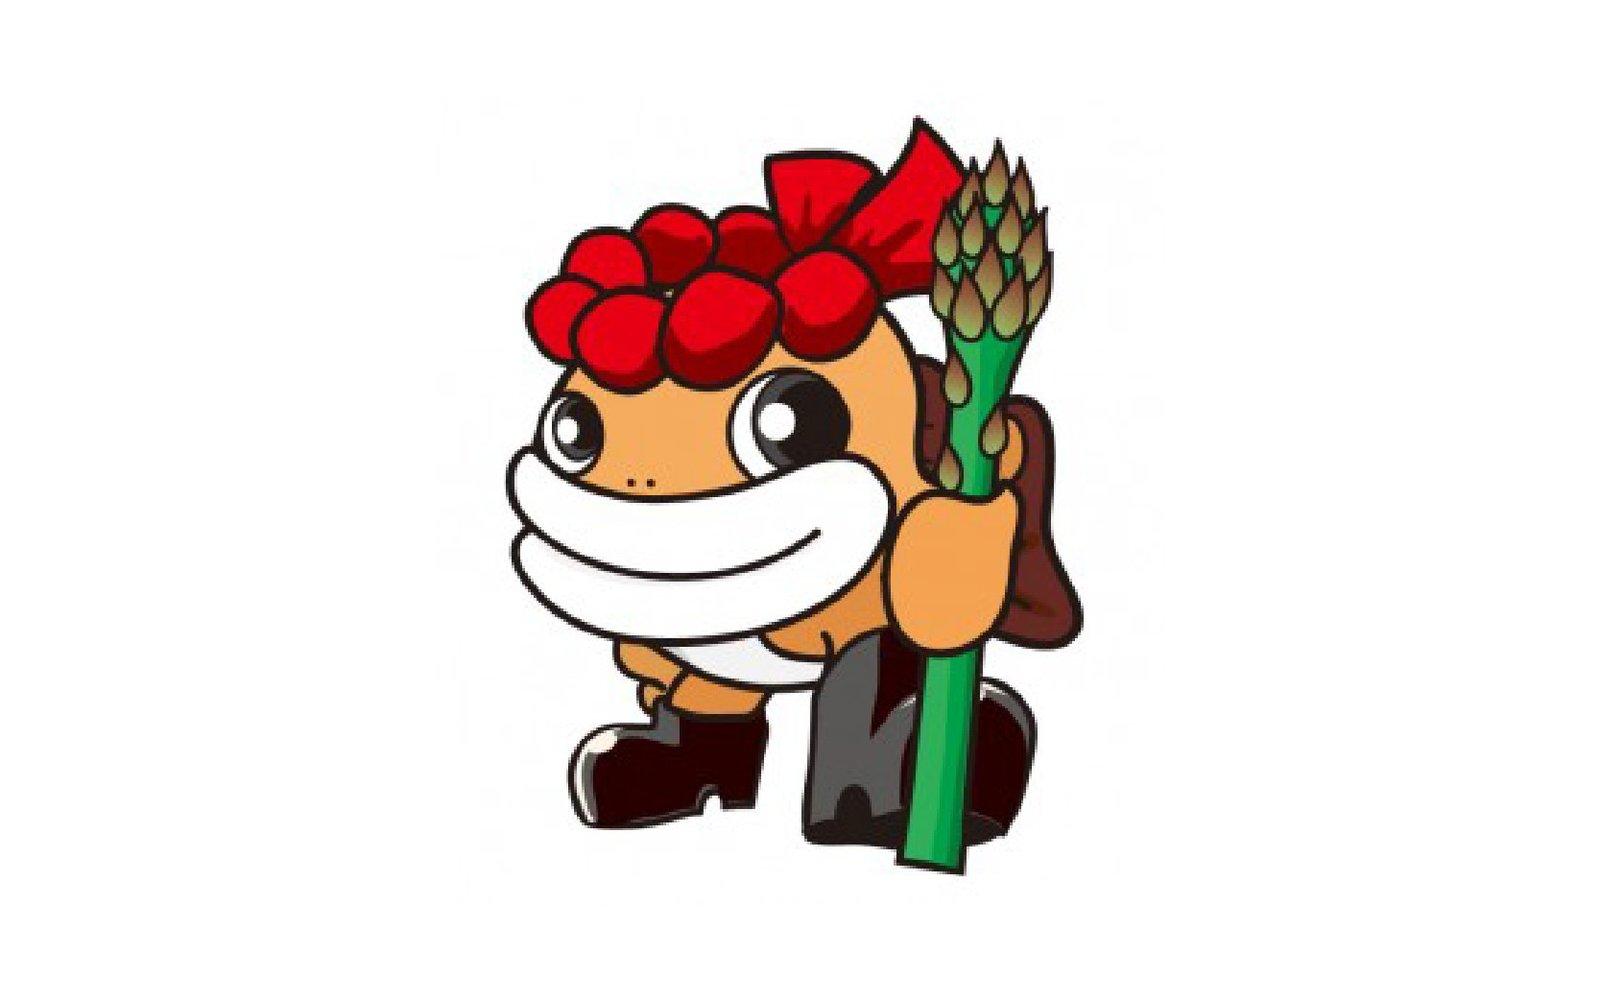 taramaru is a pollock fish mascot representing iwanai in hokkaido japan